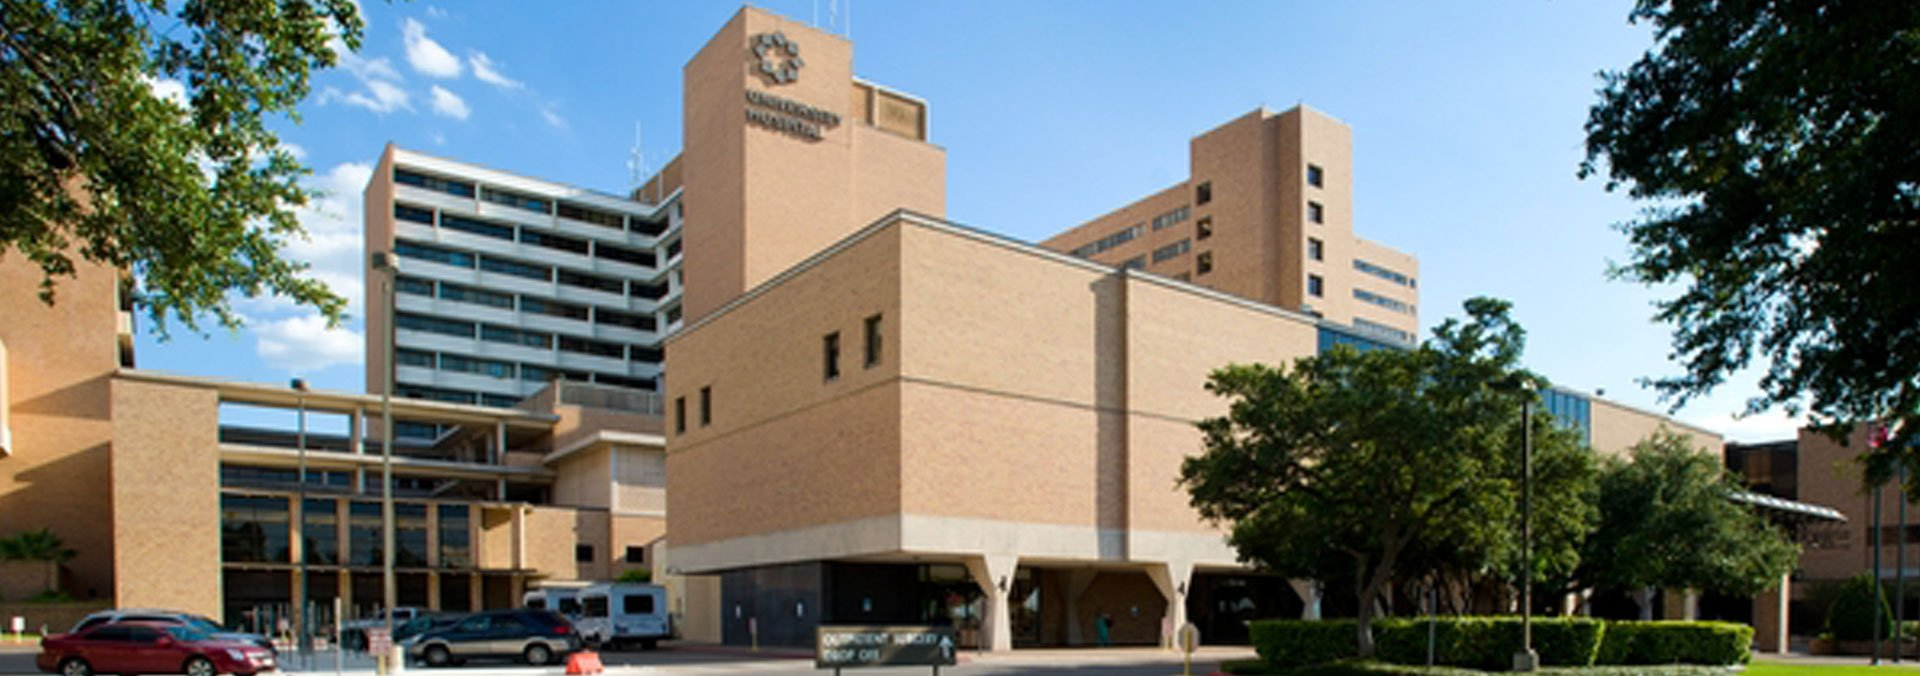 University Hospital South Texas Medical Center